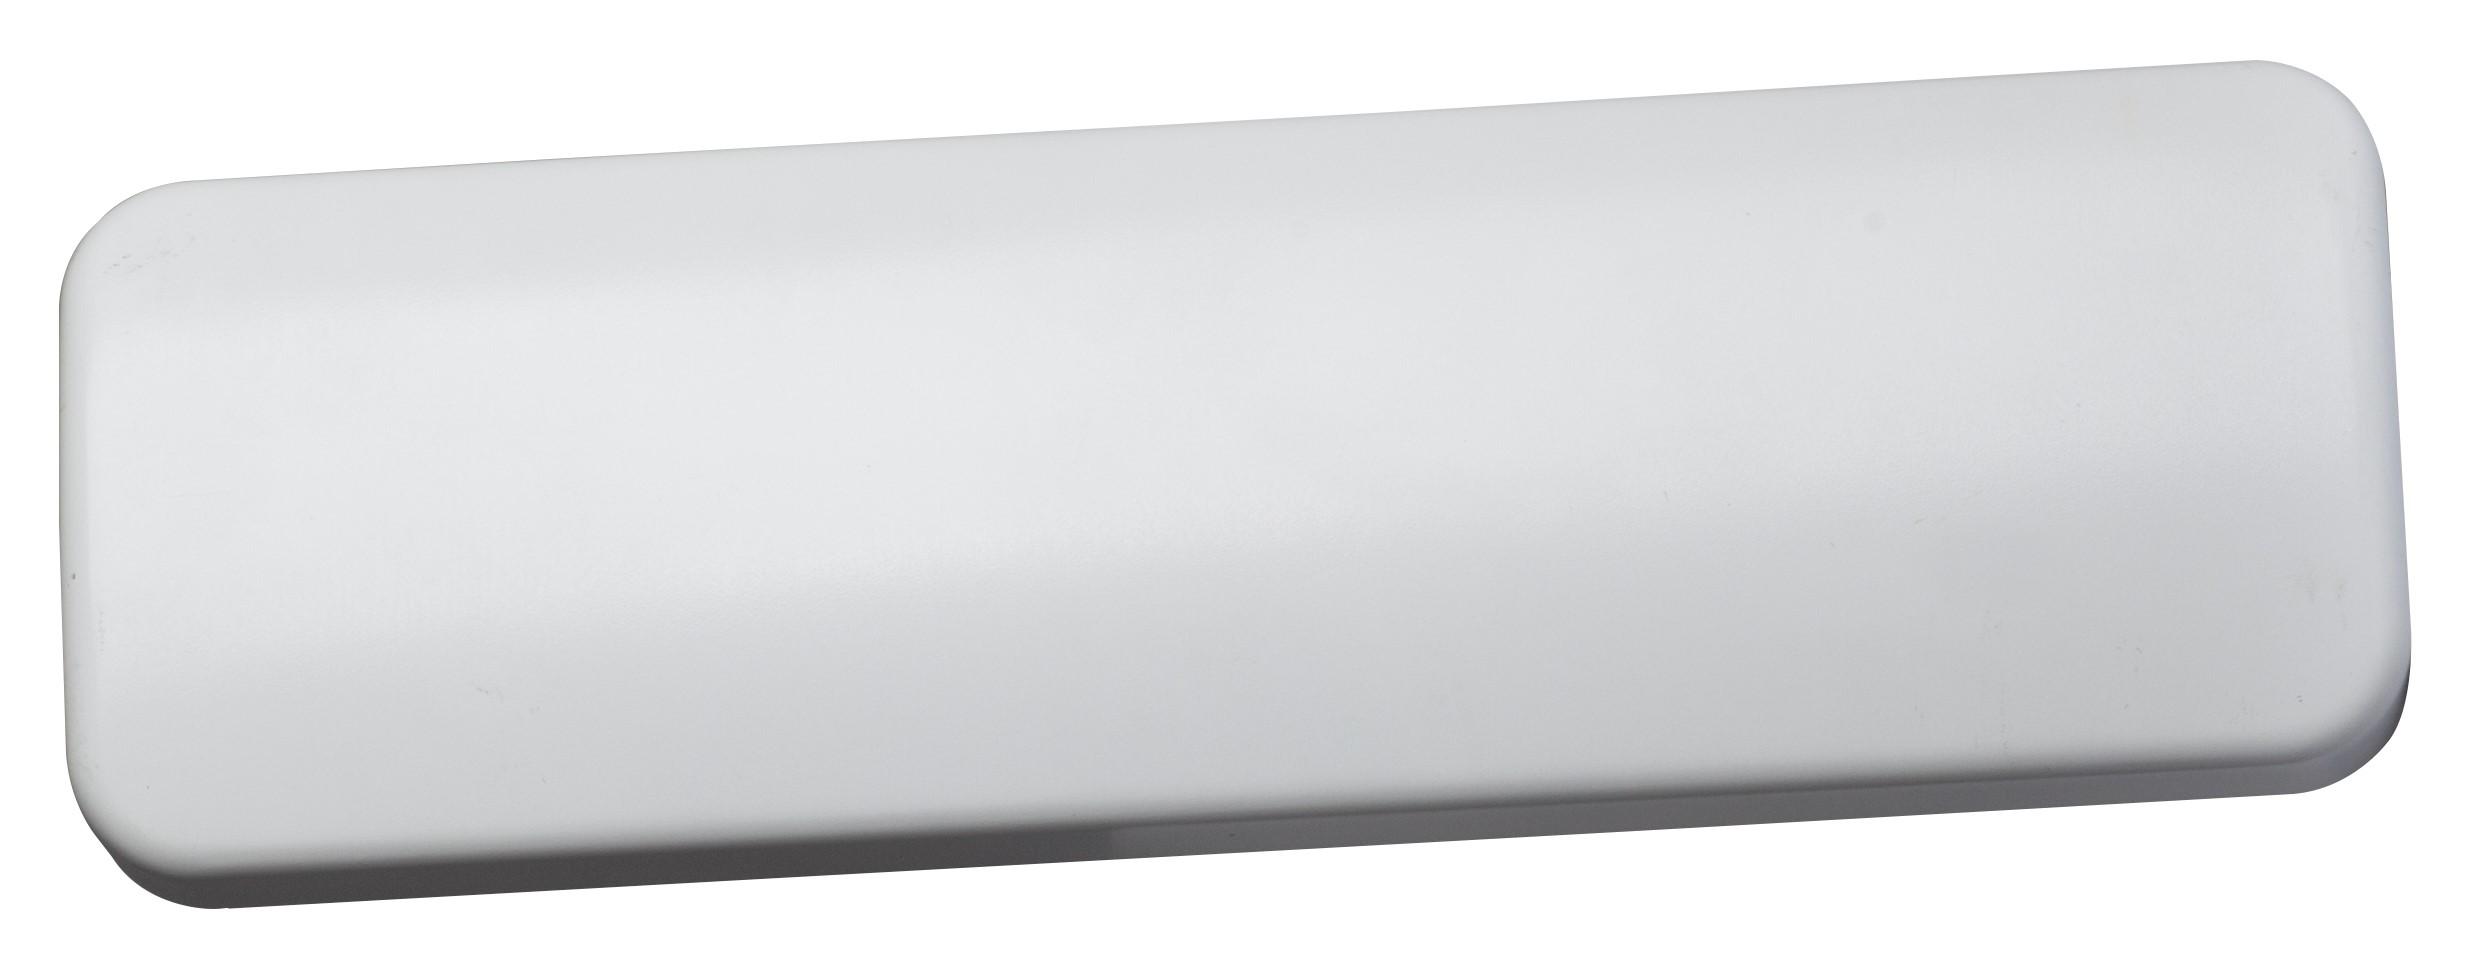 GM-21板状天线